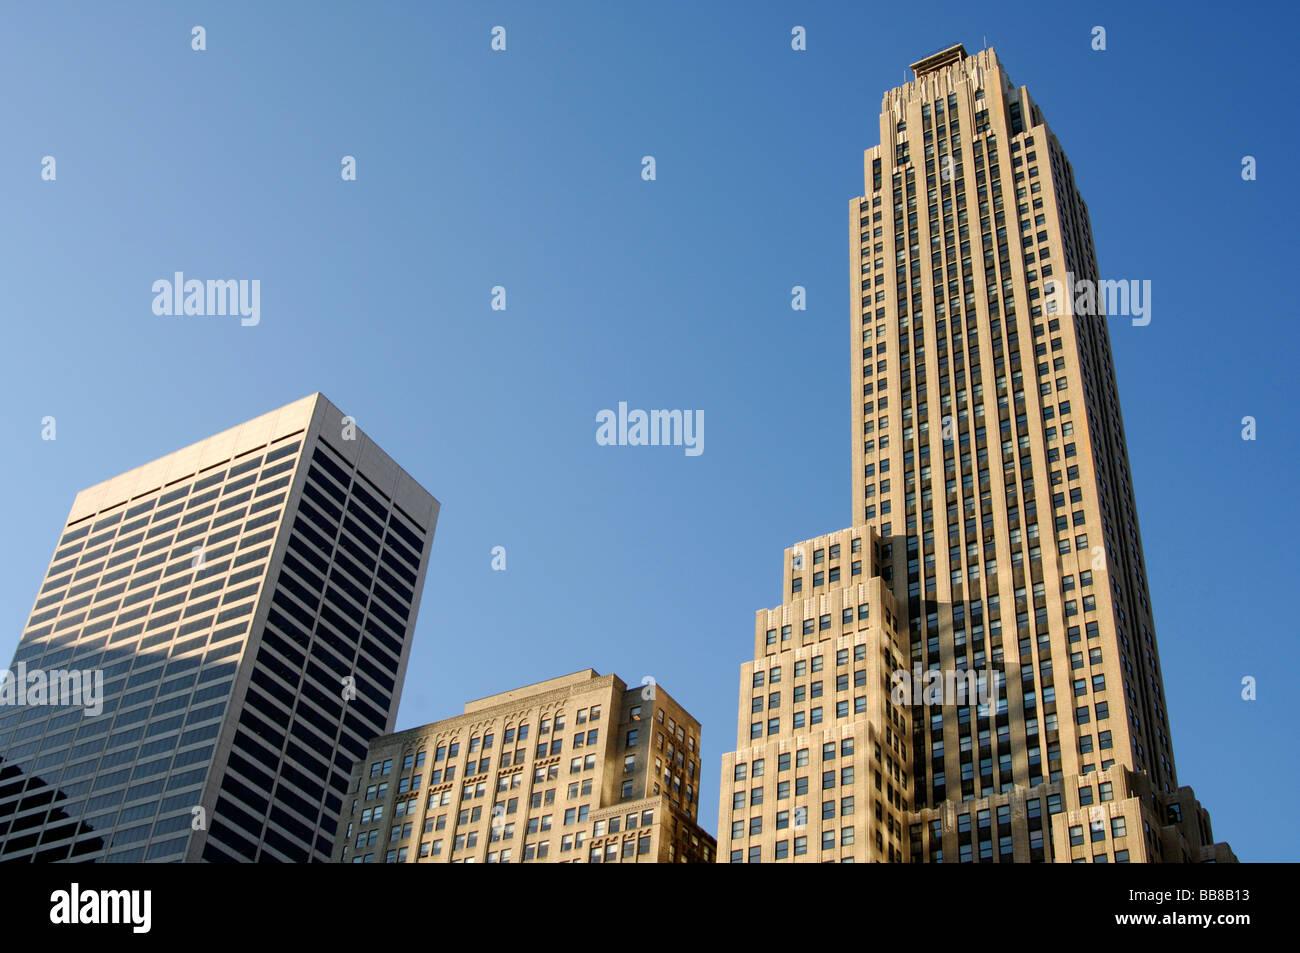 Skyscraper 500 Fifth Avenue by the architects Shreve, Lambs & Harmon, Midtown Manhattan, New York, USA - Stock Image